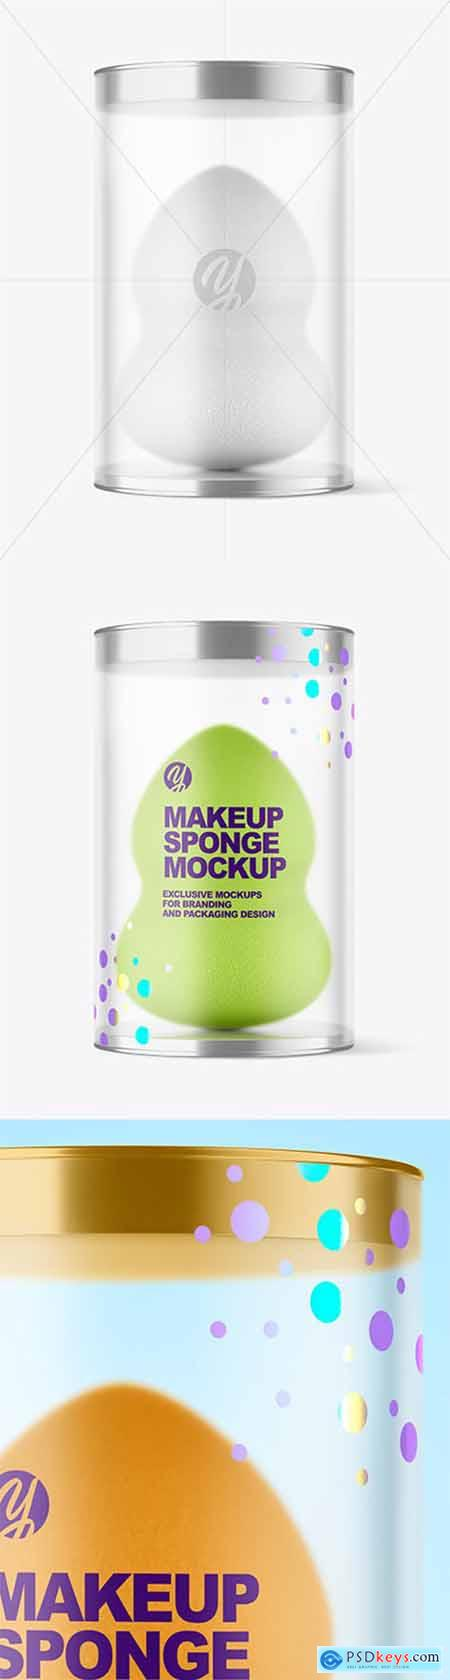 Matte Plastic Tube w- Makeup Sponge Mockup 79858